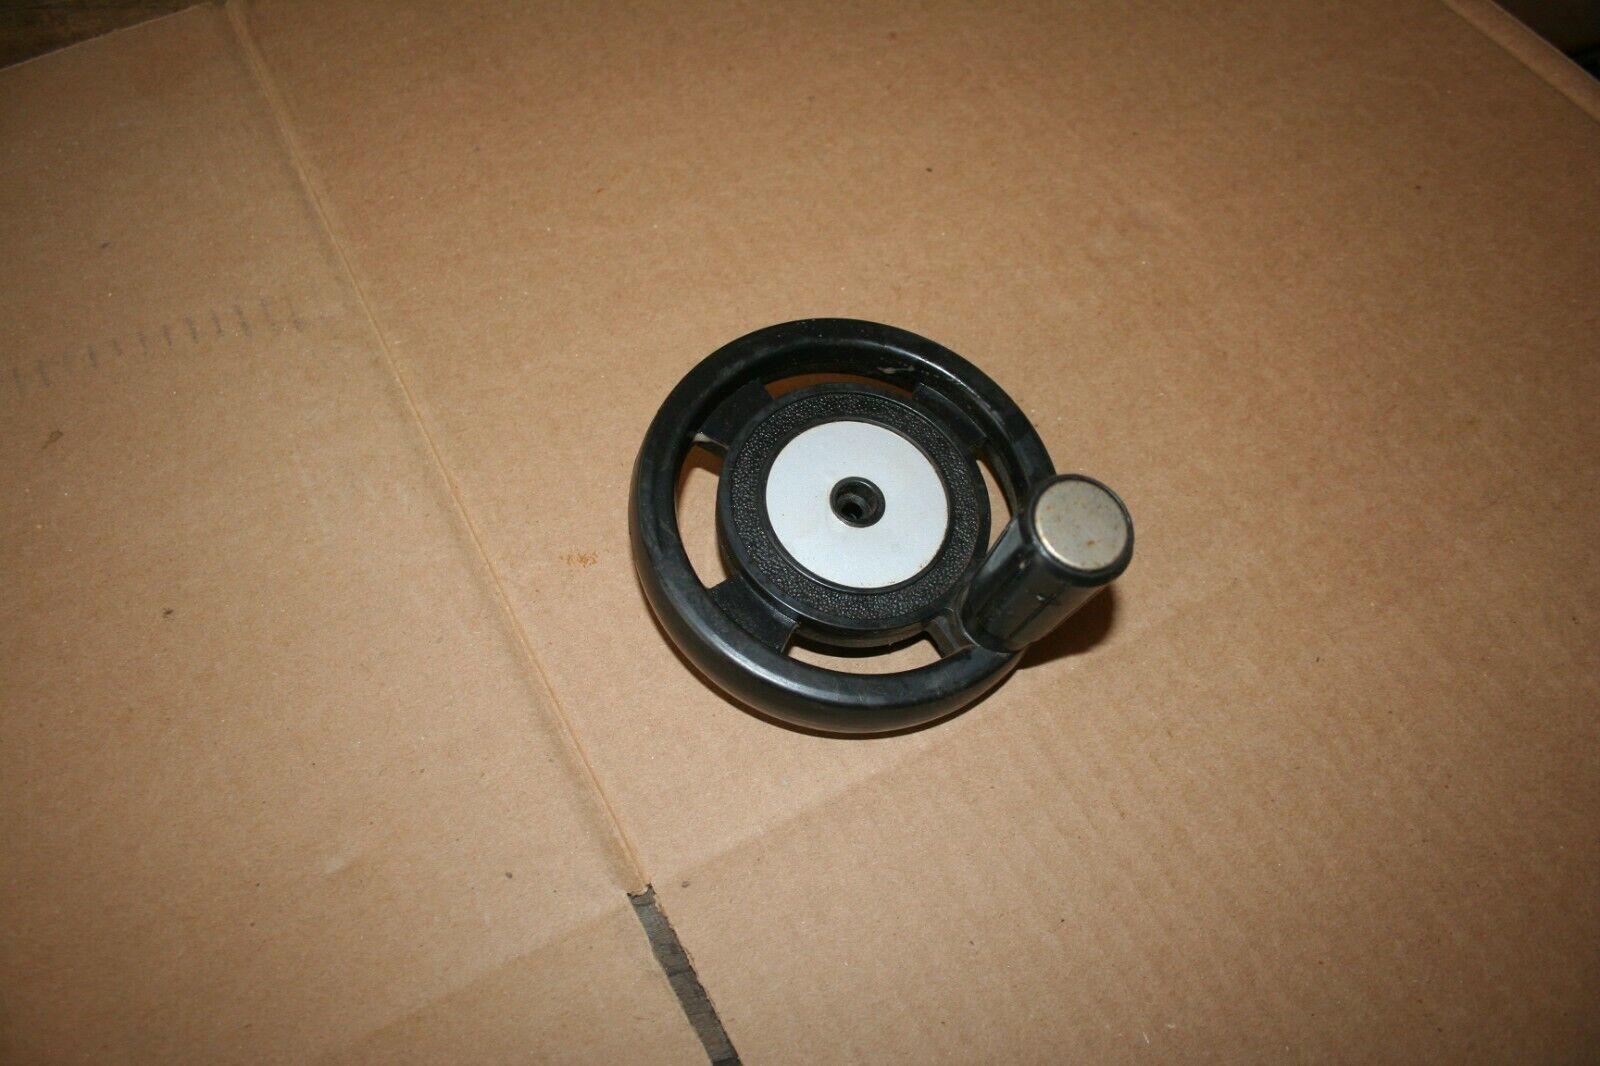 Tablesaw Craftsman Handle Wheel Pt#14900602